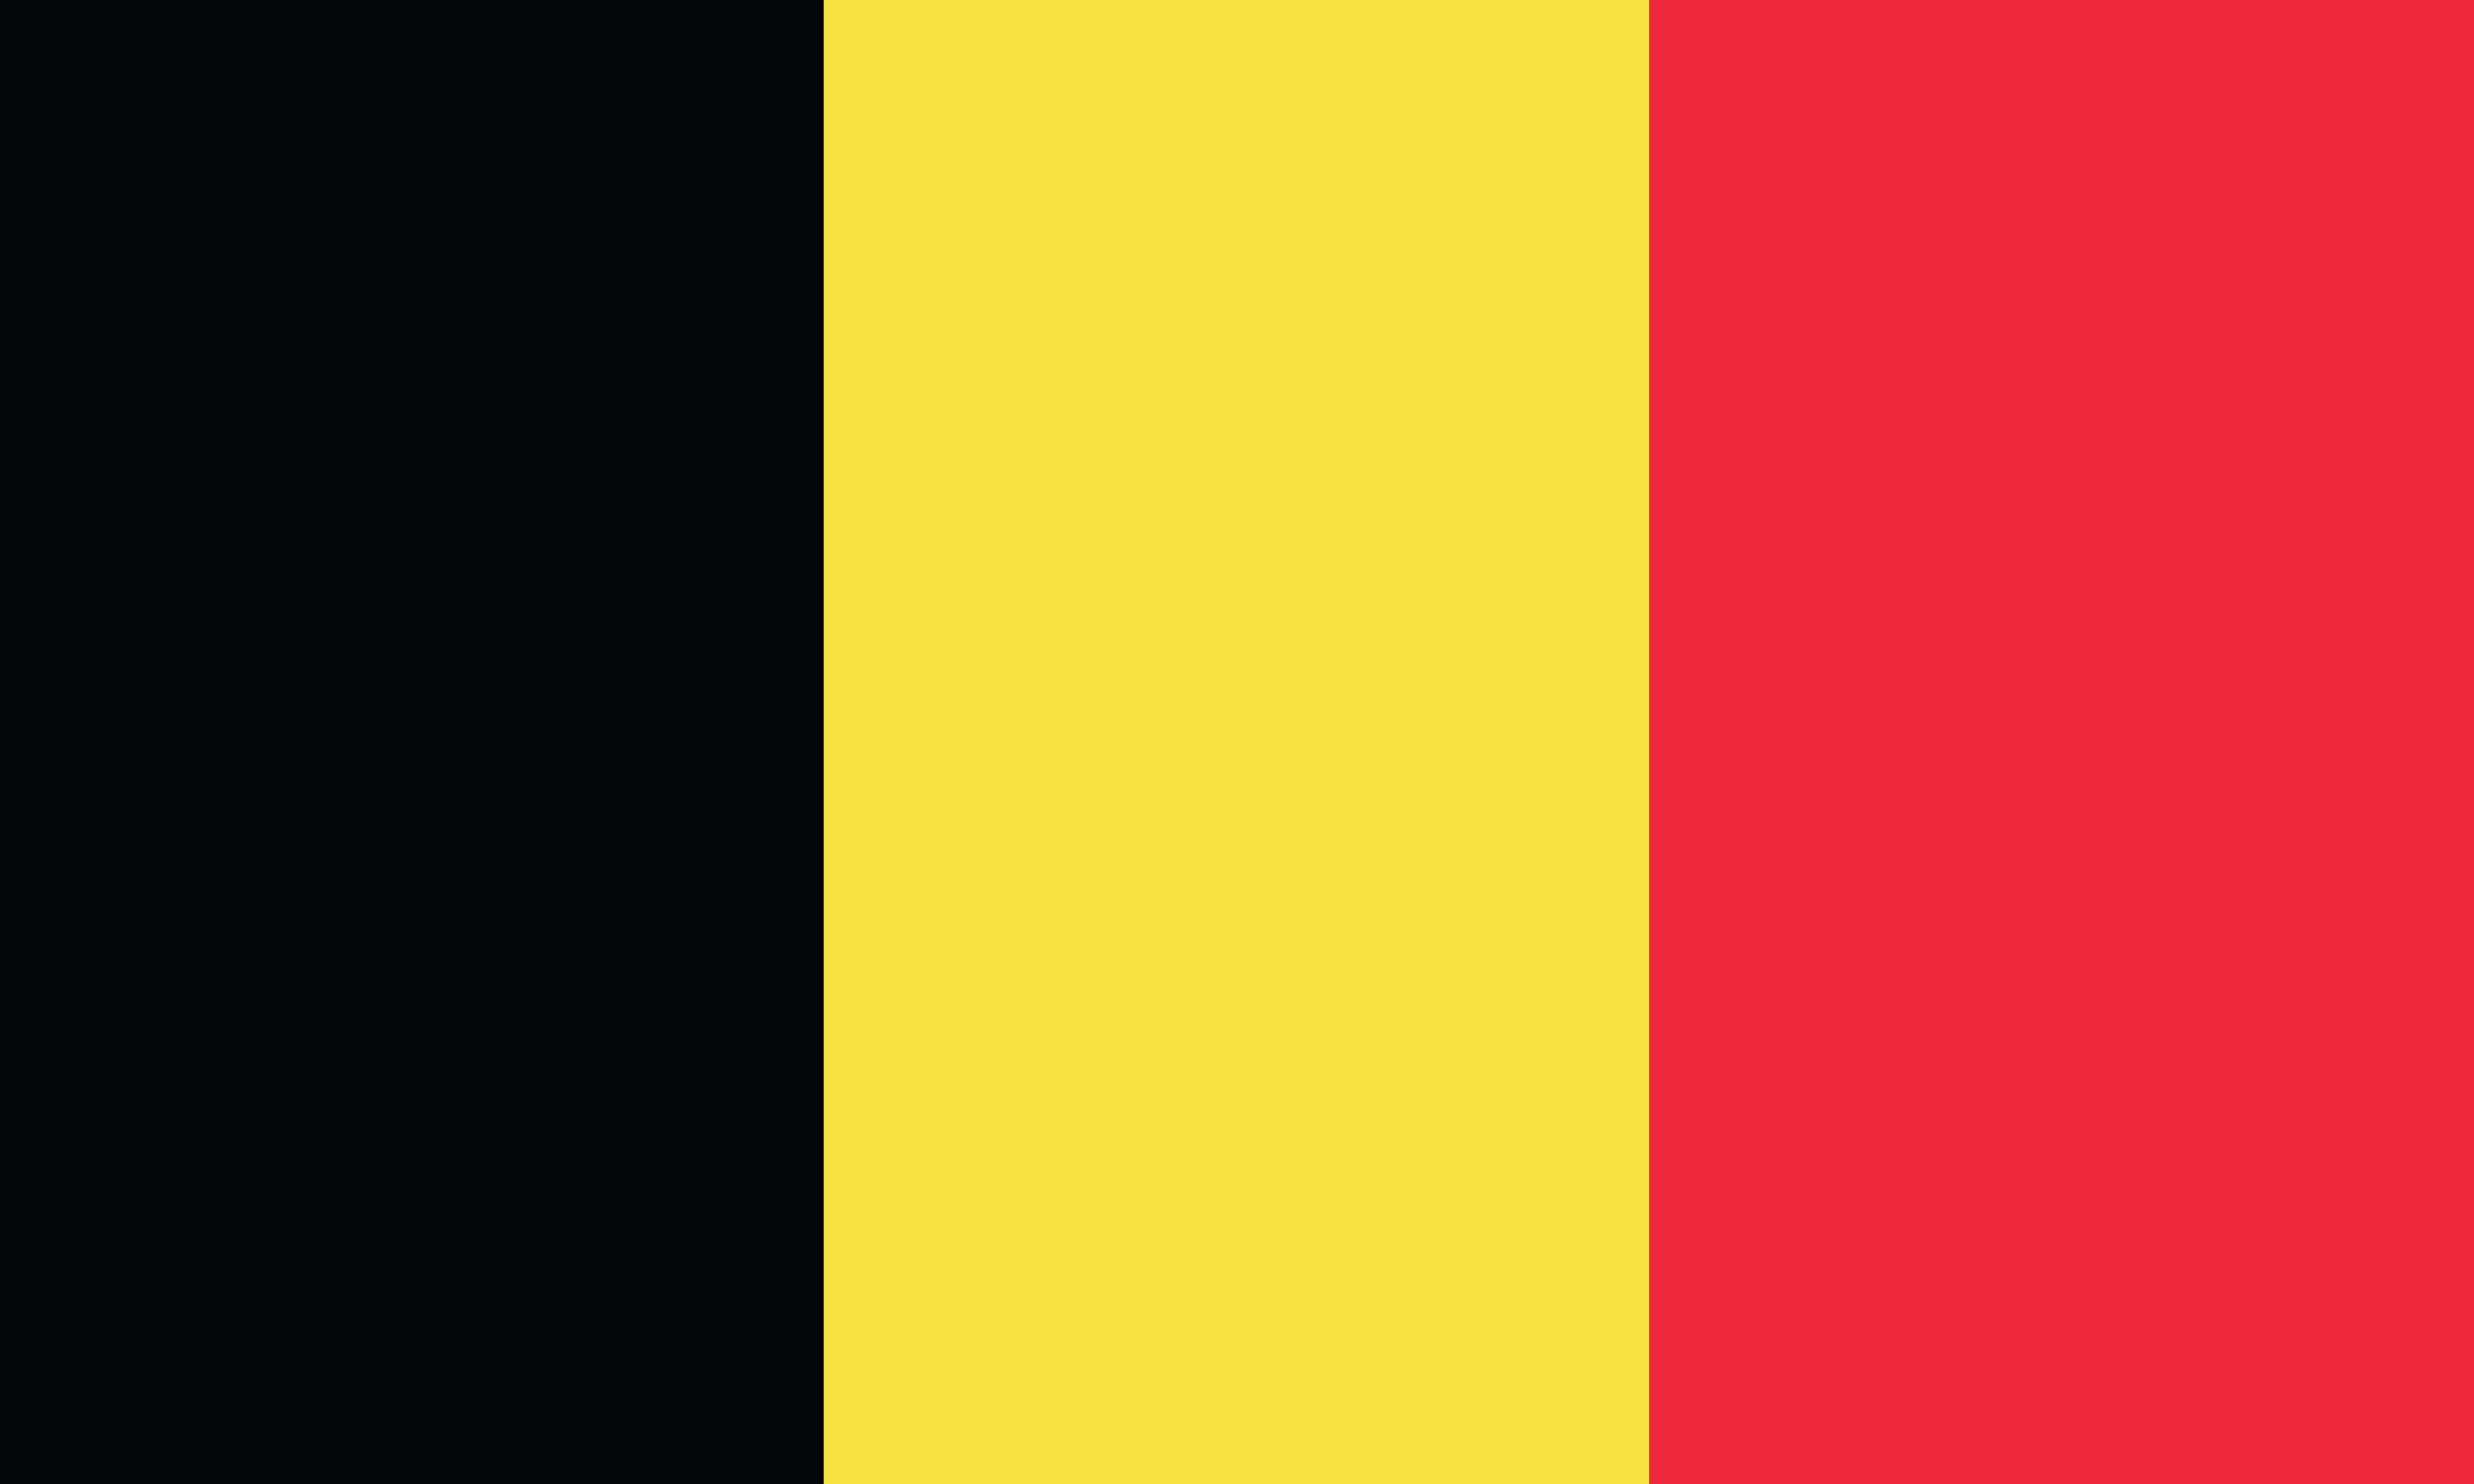 Belgium flag - Index on Censorship Index on Censorship